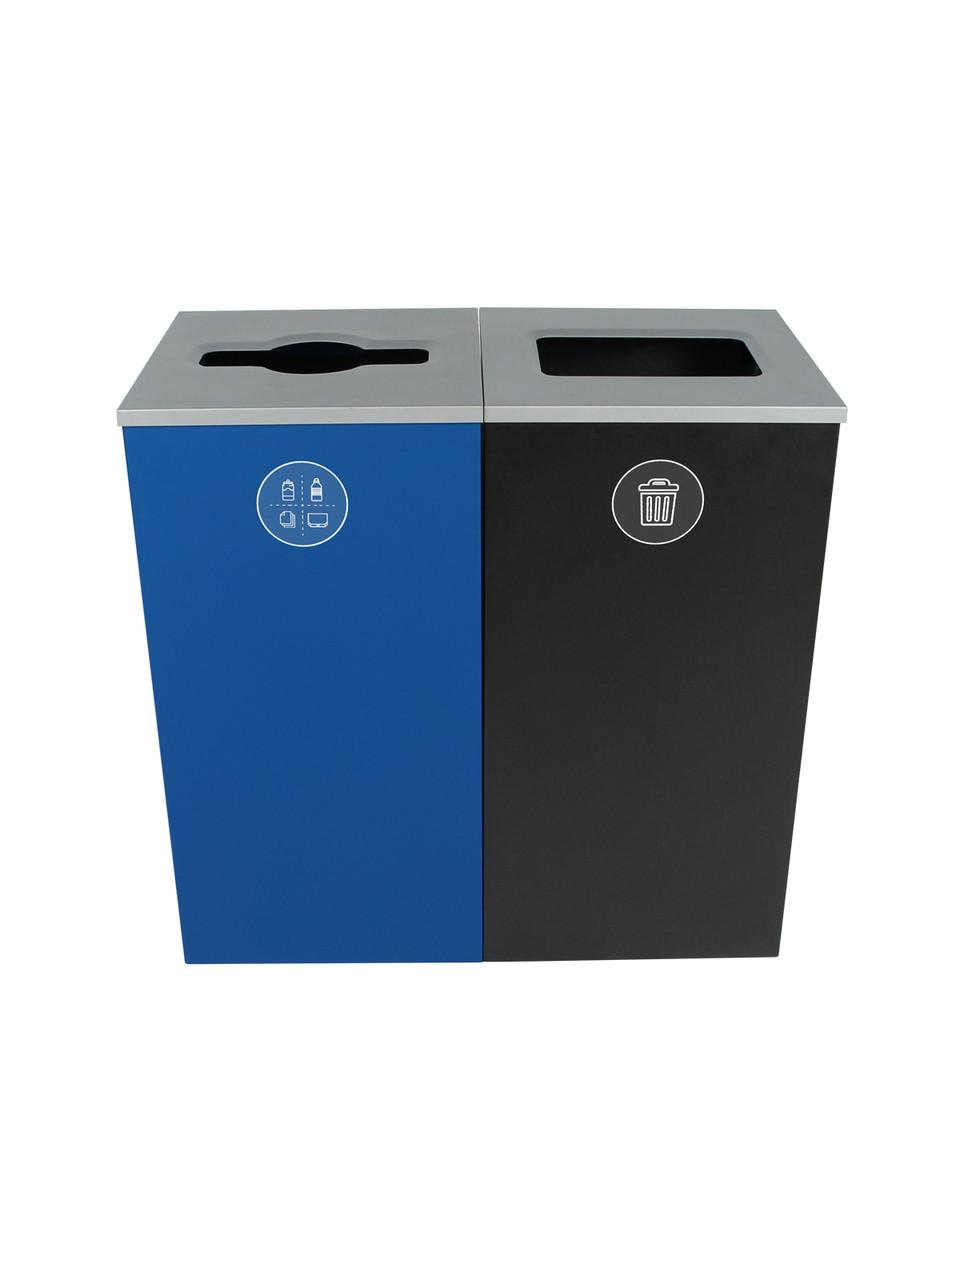 48 Gallon Spectrum Cube Dual Trash Can & Recycle Bin Blue/Black 8107091-24